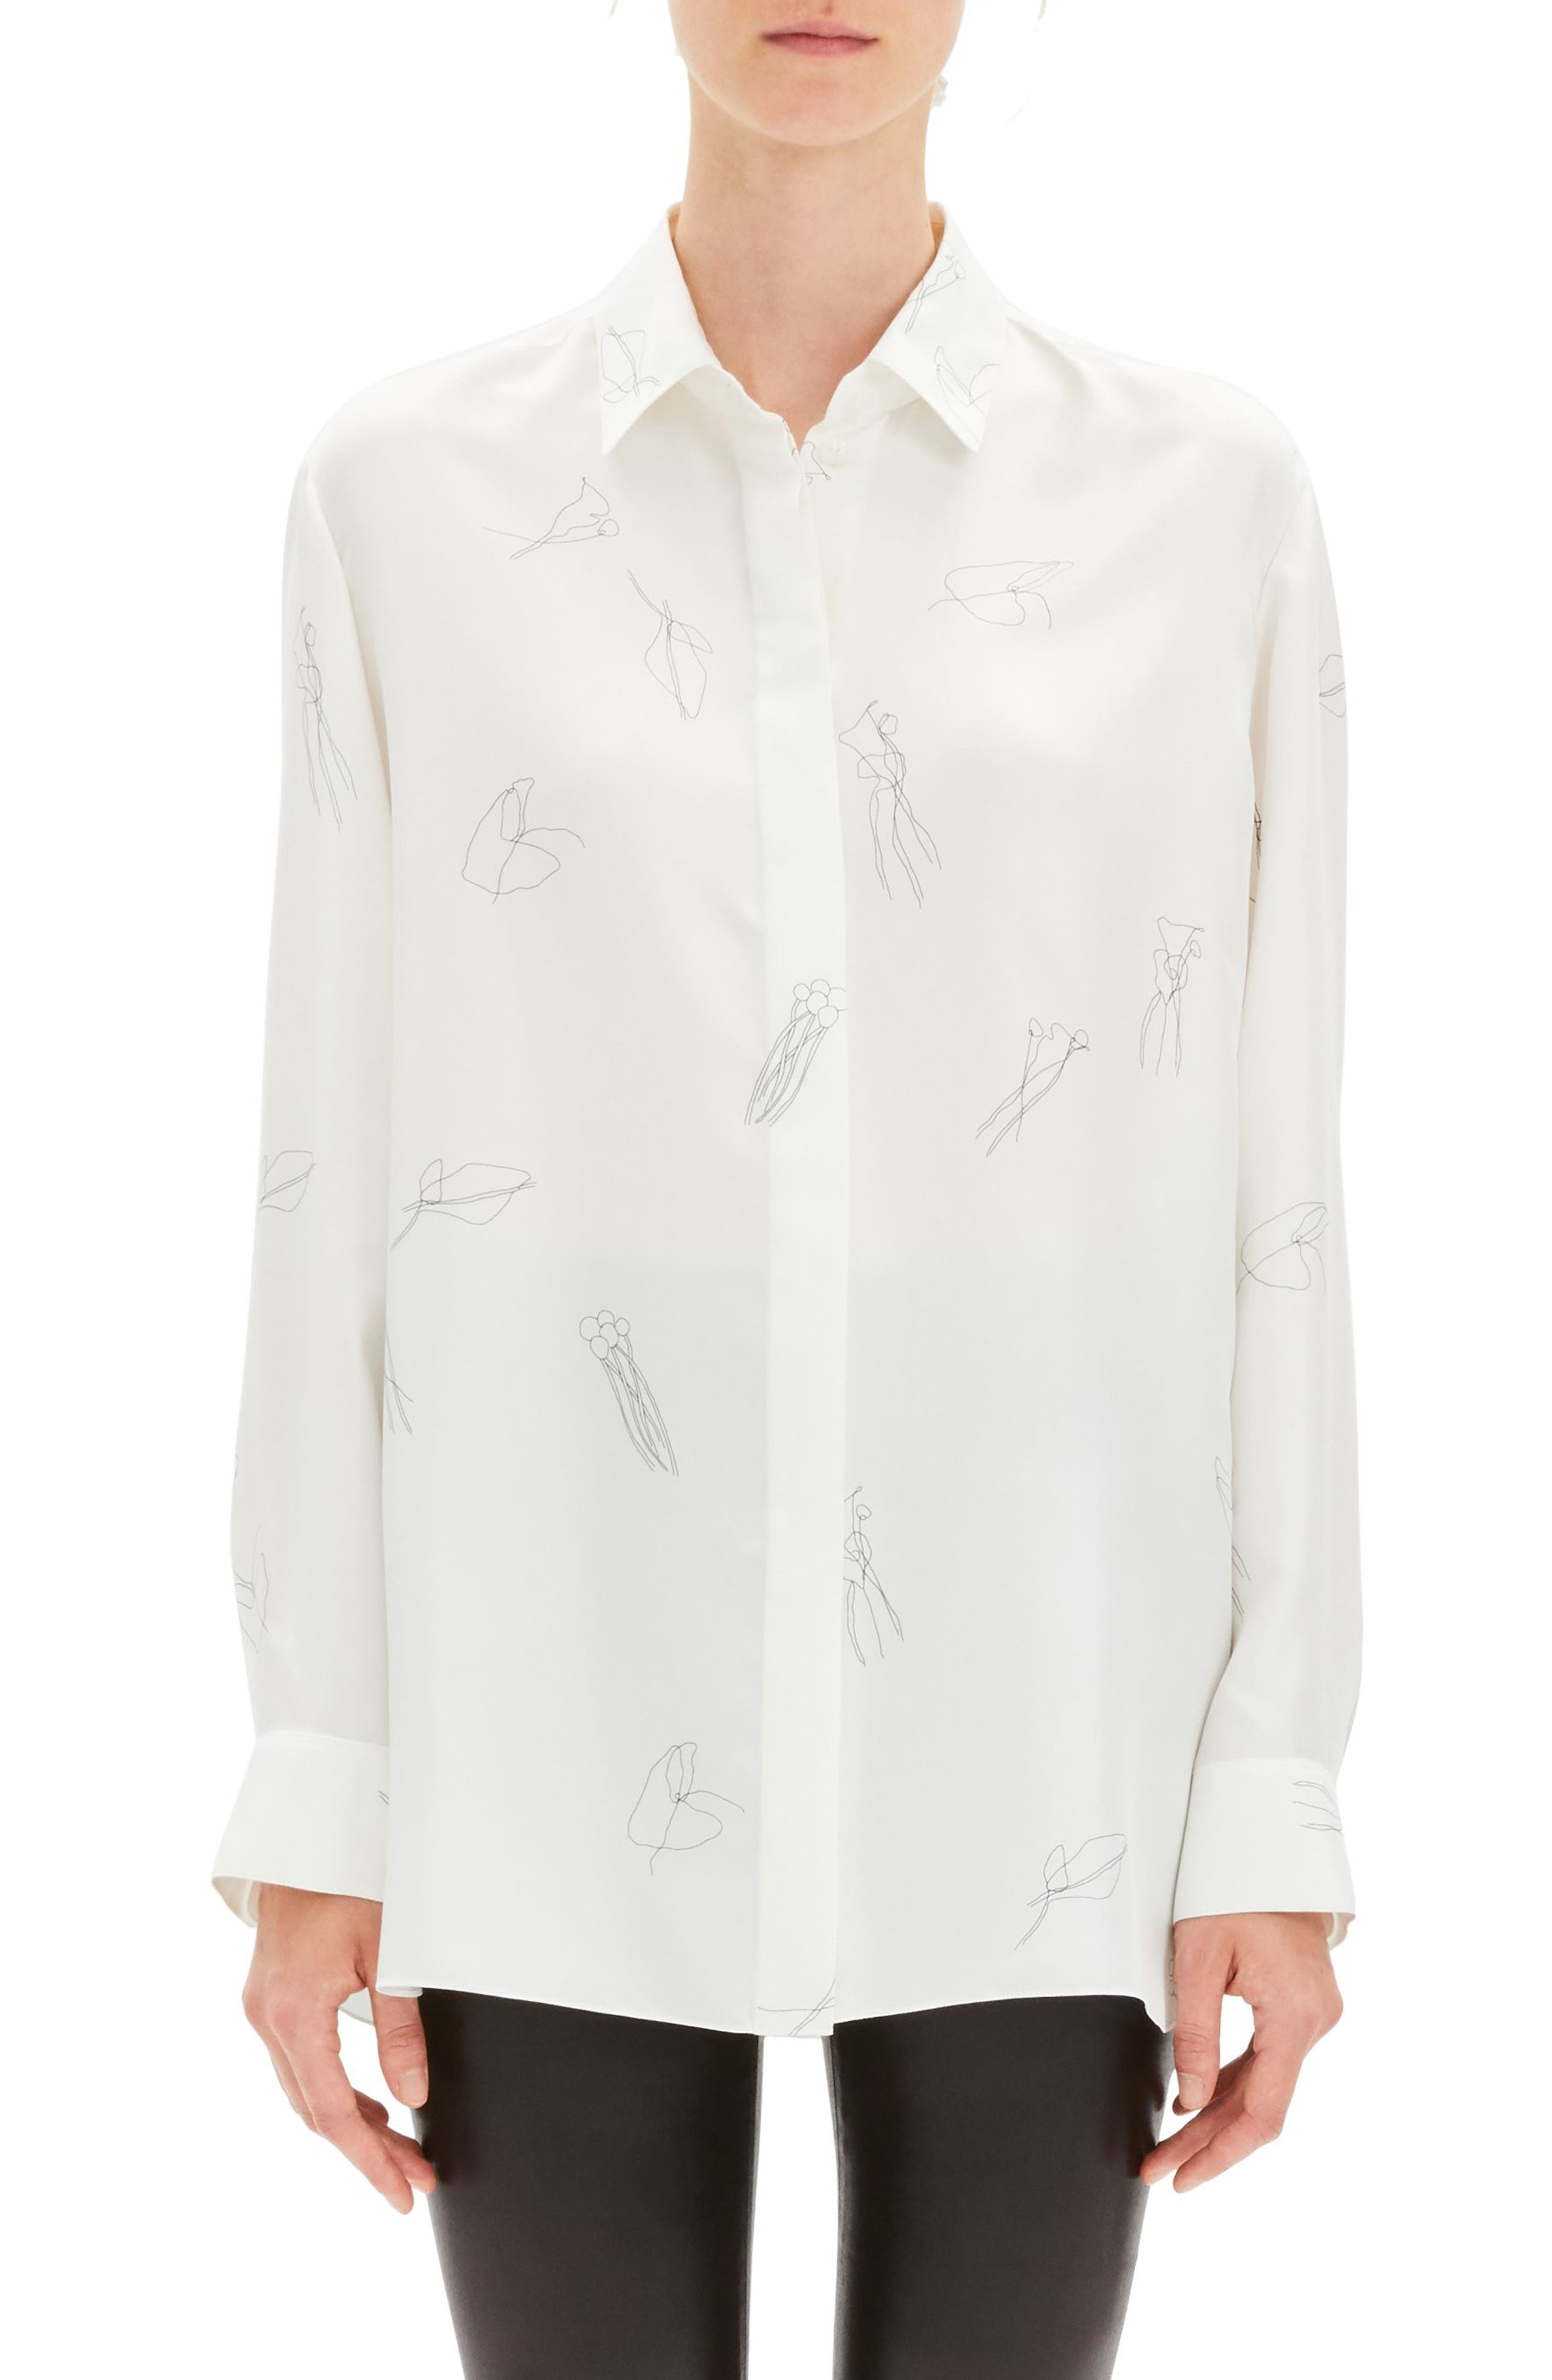 THEORY, Classic Menswear Silk Shirt, Main thumbnail 1, color, 199